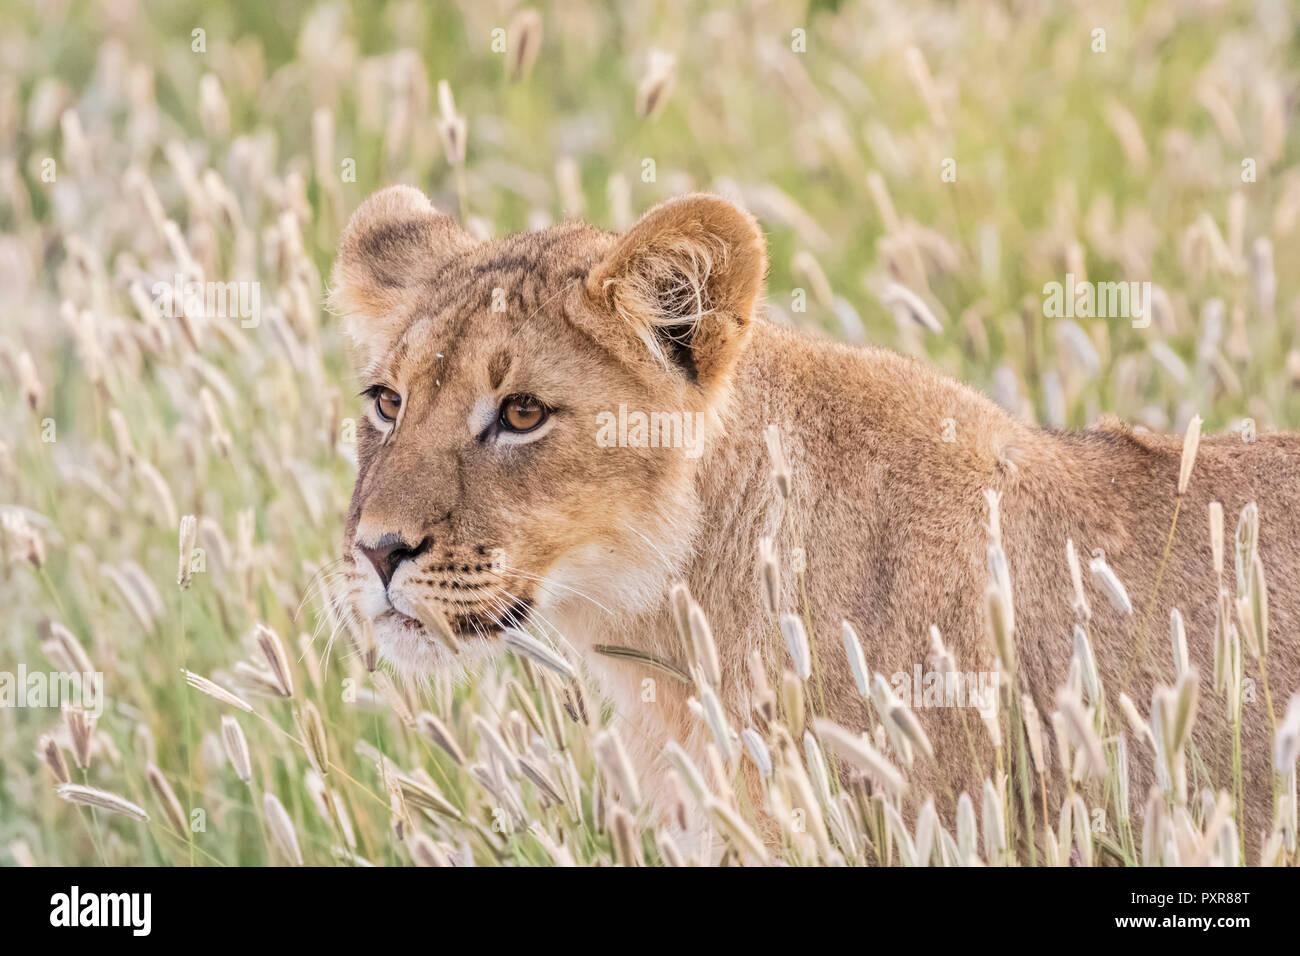 Botswana, Kgalagadi Transfrontier Park, young lion, Panthera leo - Stock Image